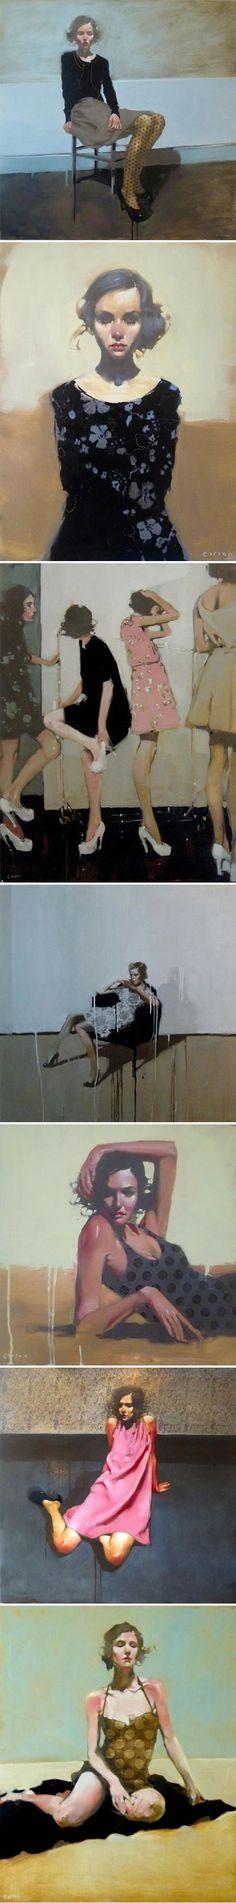 American painter Michael Carson